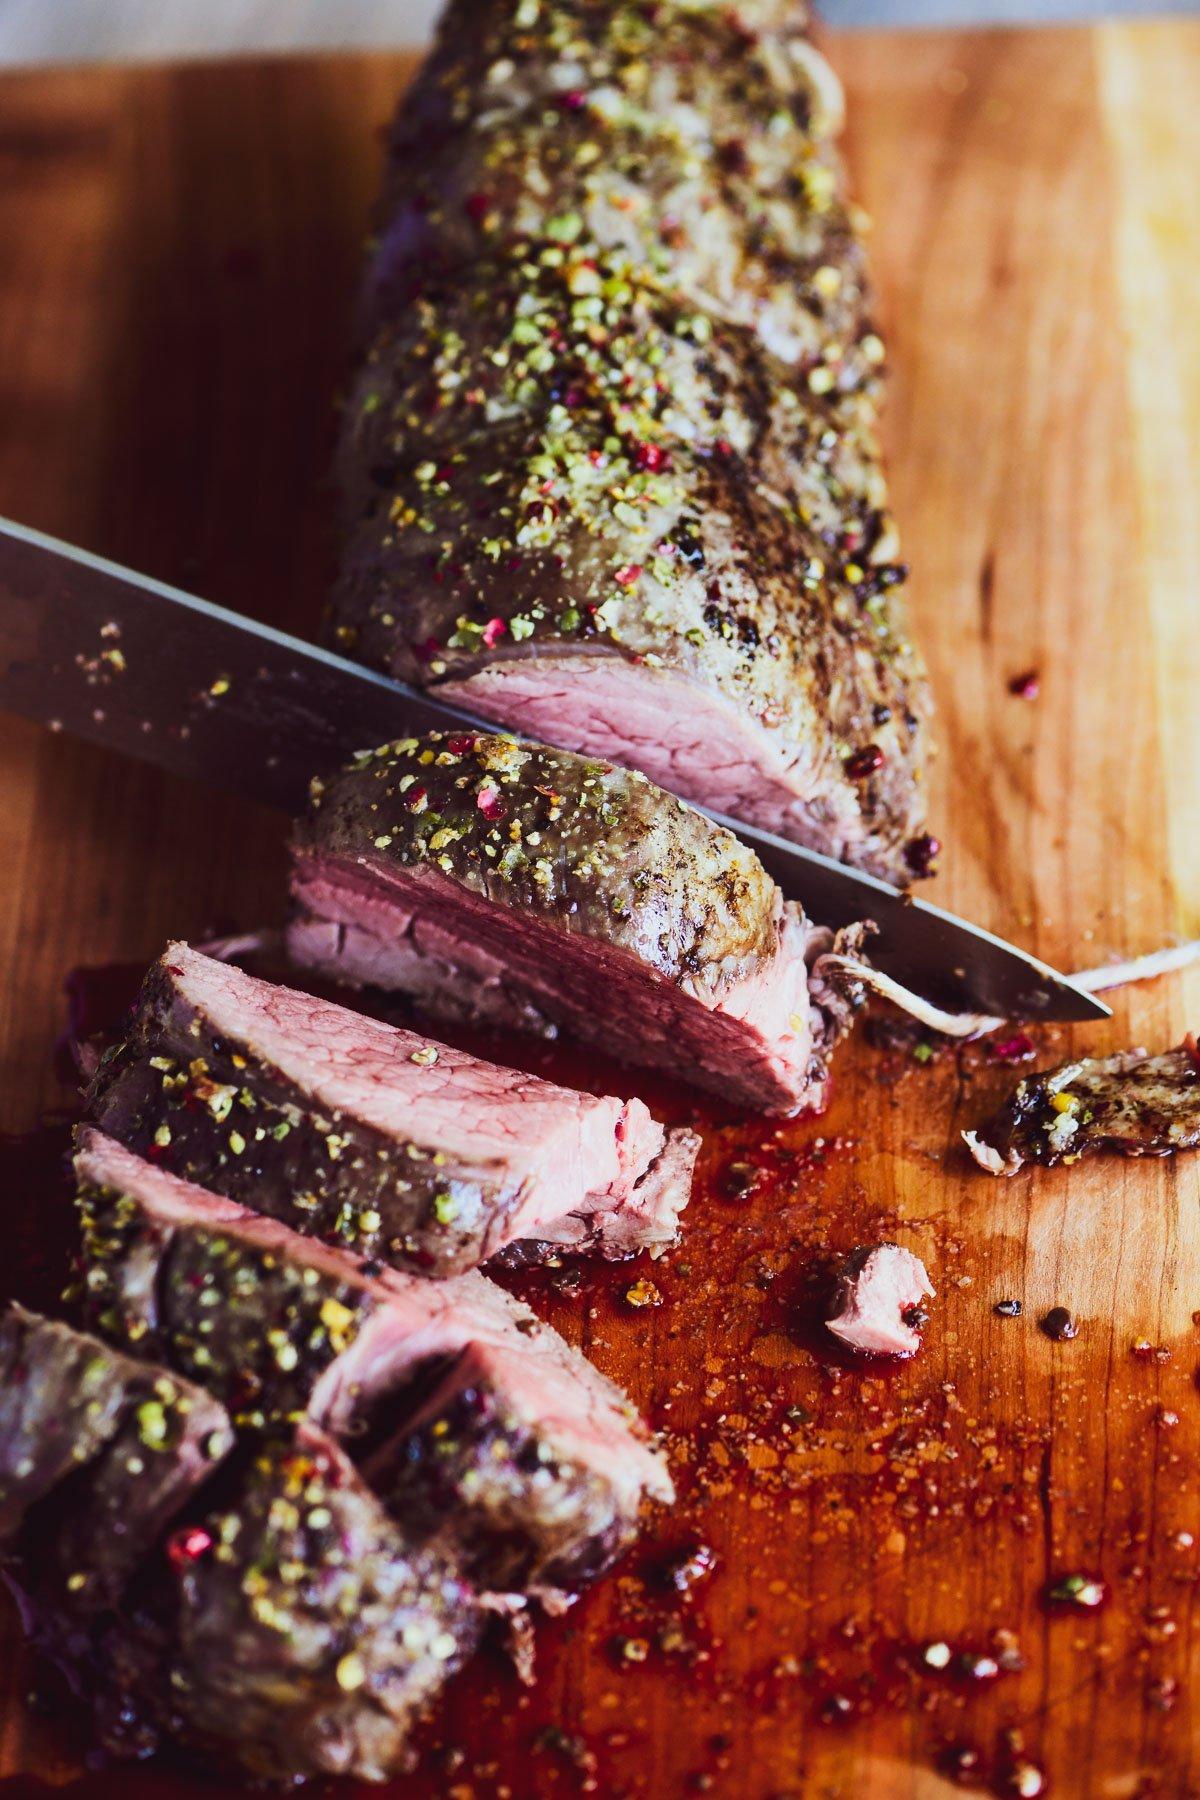 beef tenderloin being sliced on a Boos cutting board